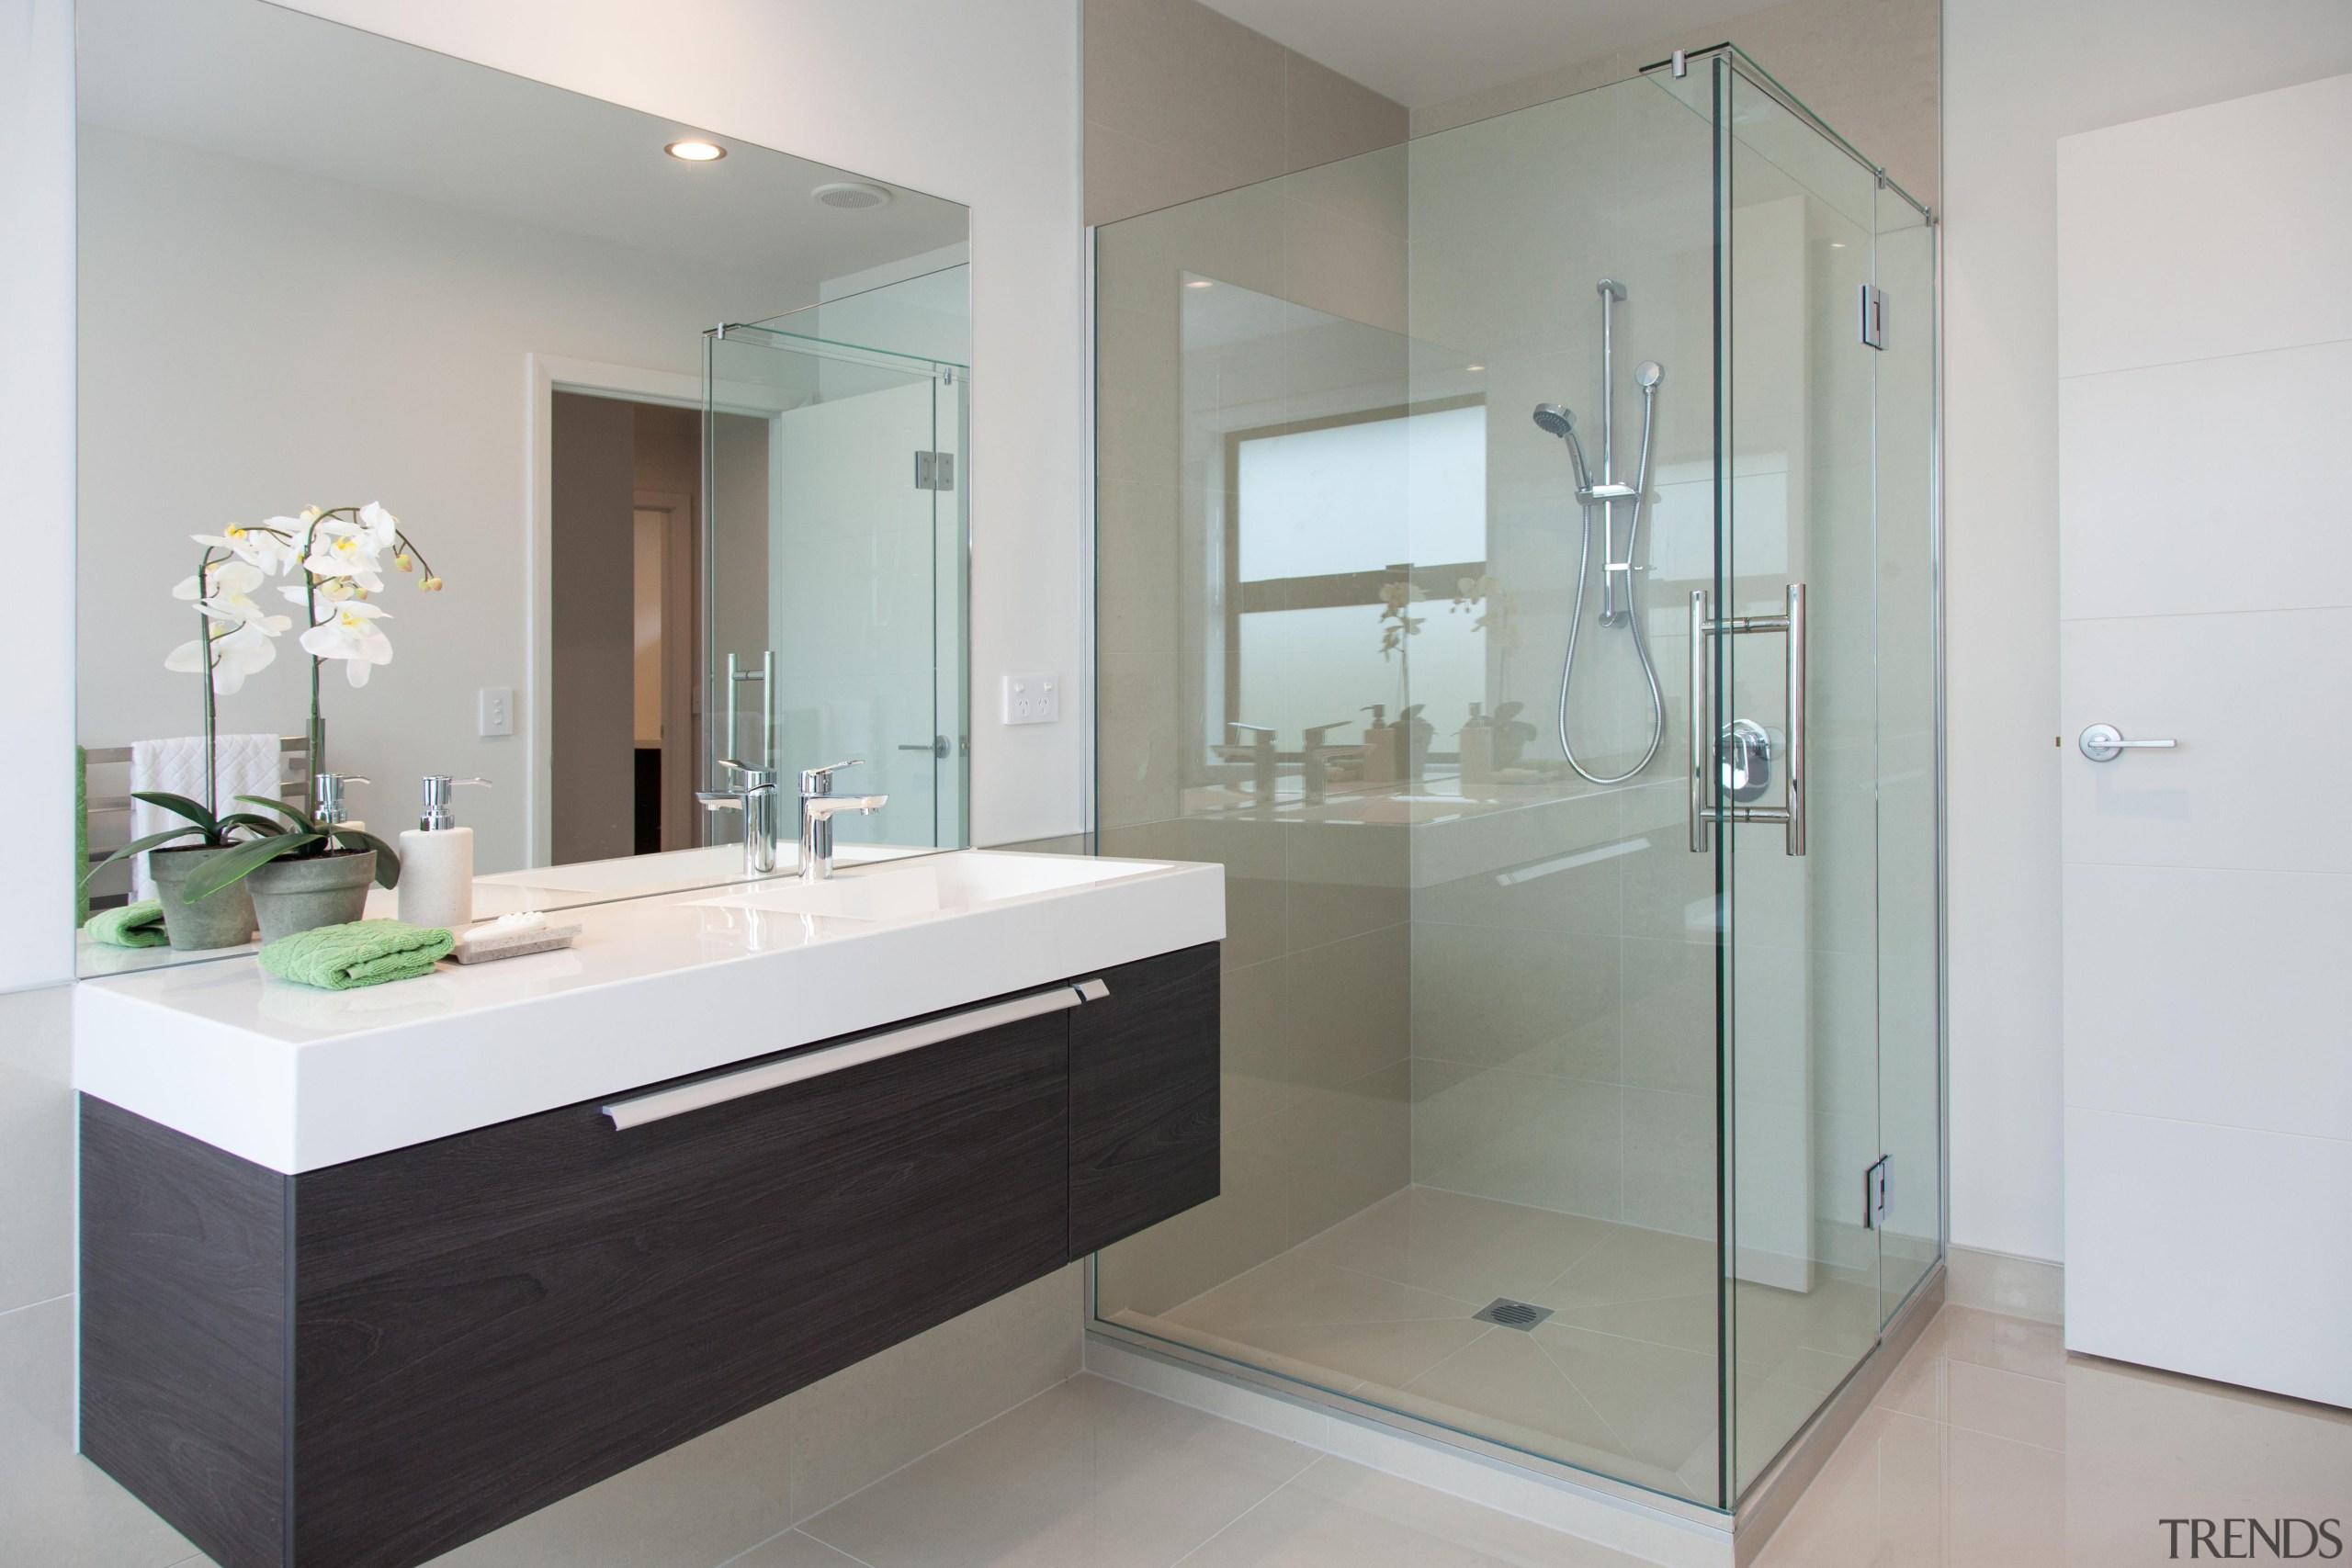 For more information, please visit www.gjgardner.co.nz bathroom, bathroom accessory, bathroom cabinet, glass, interior design, product design, room, gray